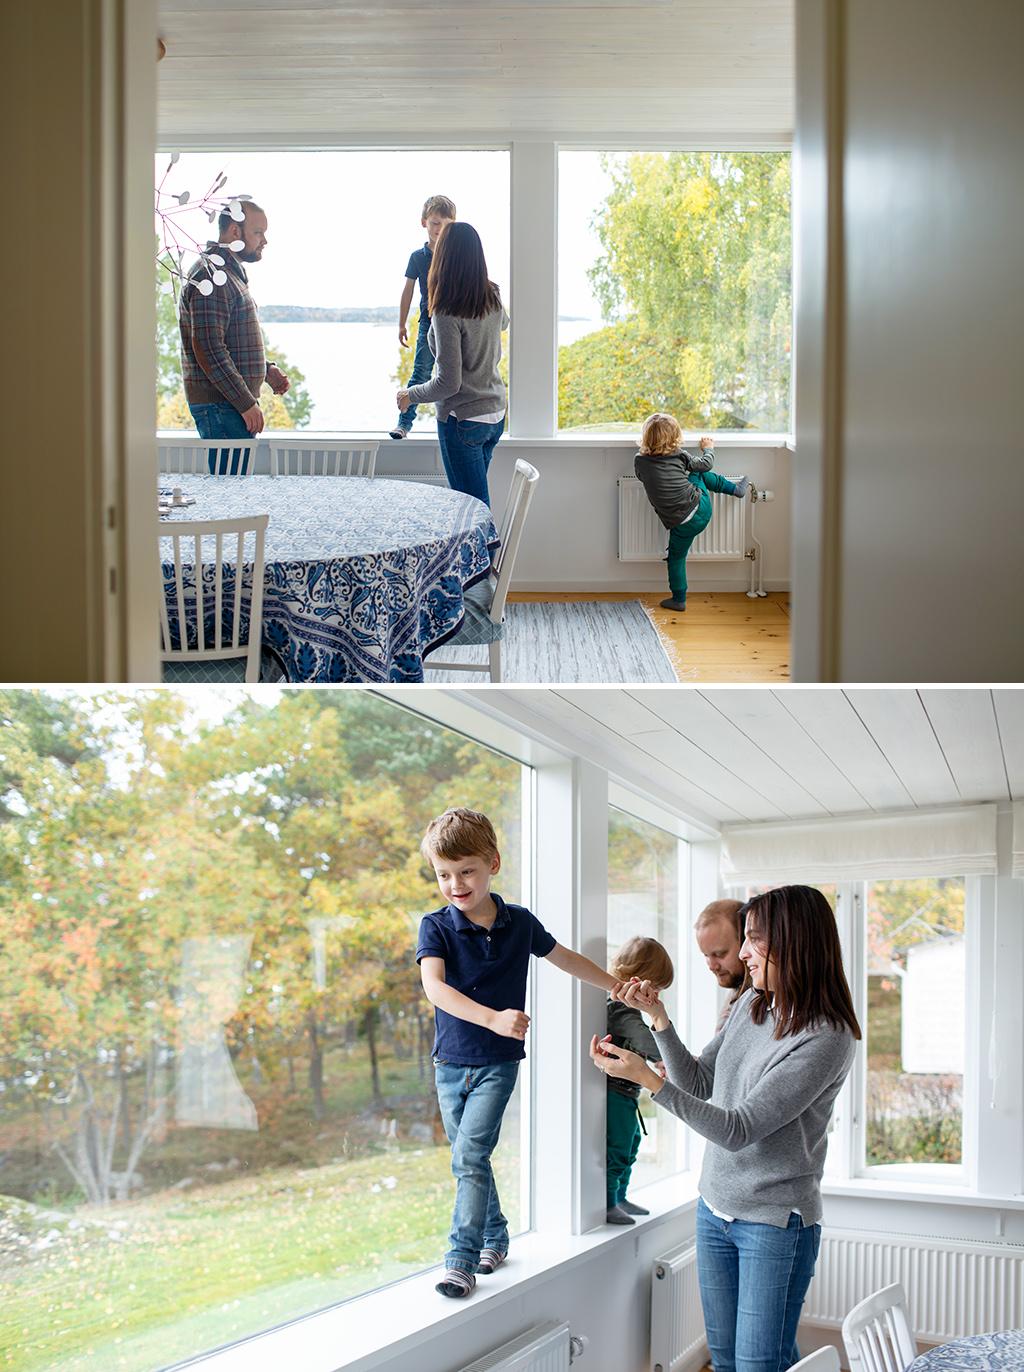 Hostfotografering_Lifestyle_hemma-hos-fotografering_Familjefotograf_Stockholm_19.jpg